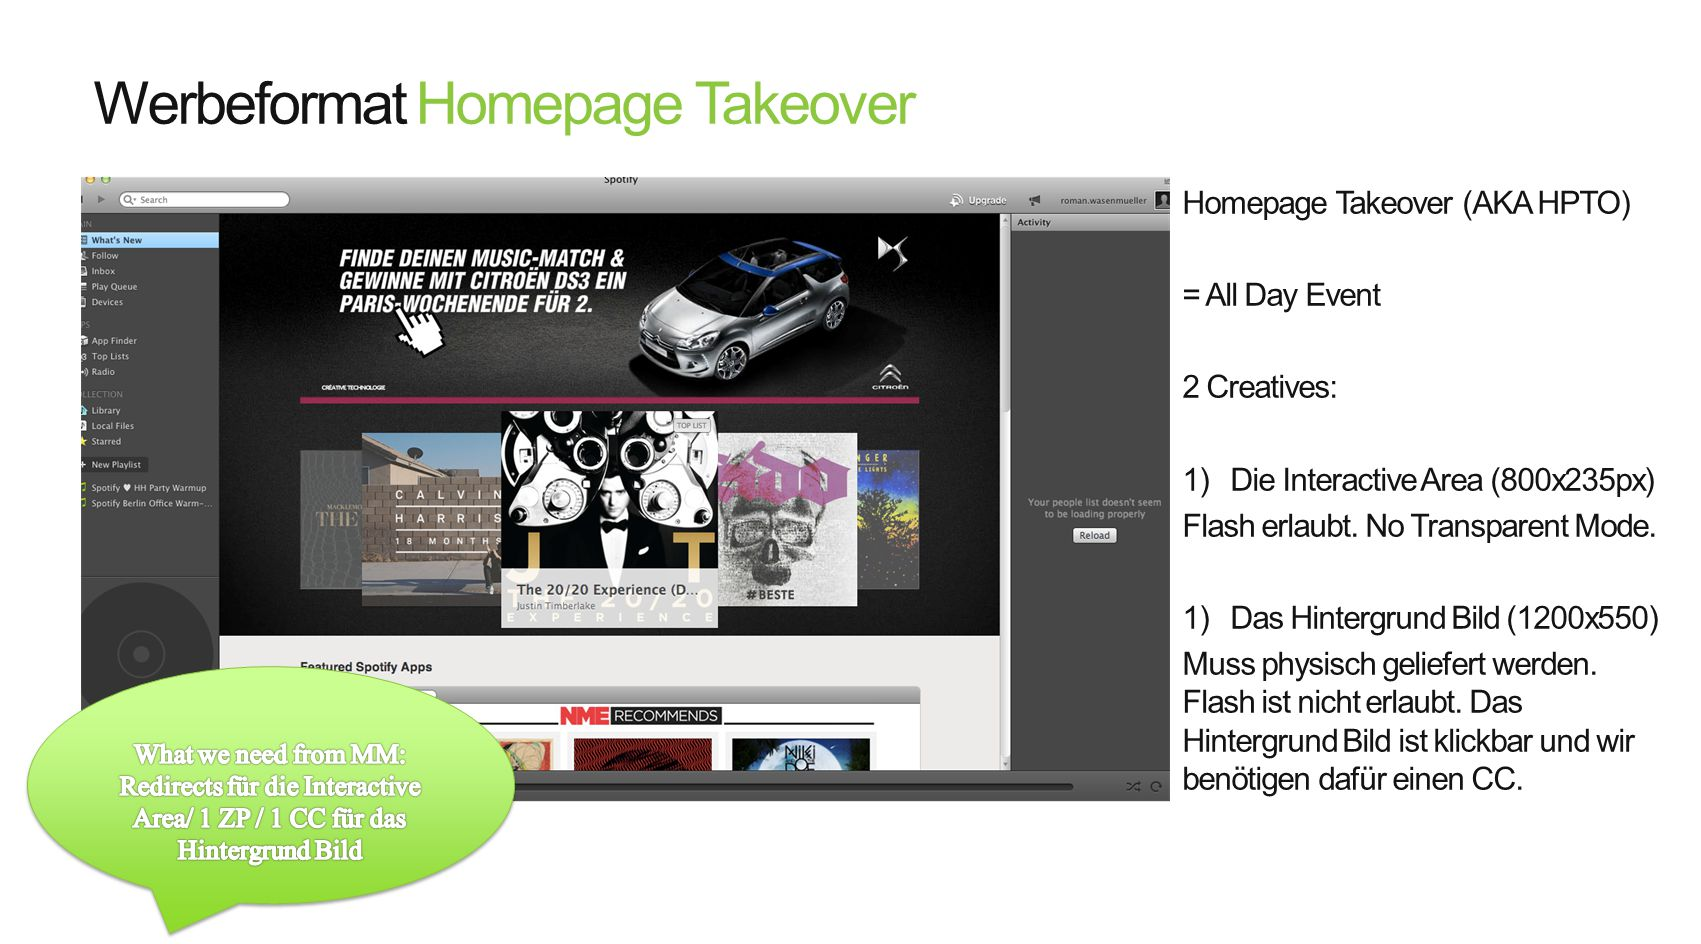 Werbeformat Homepage Takeover